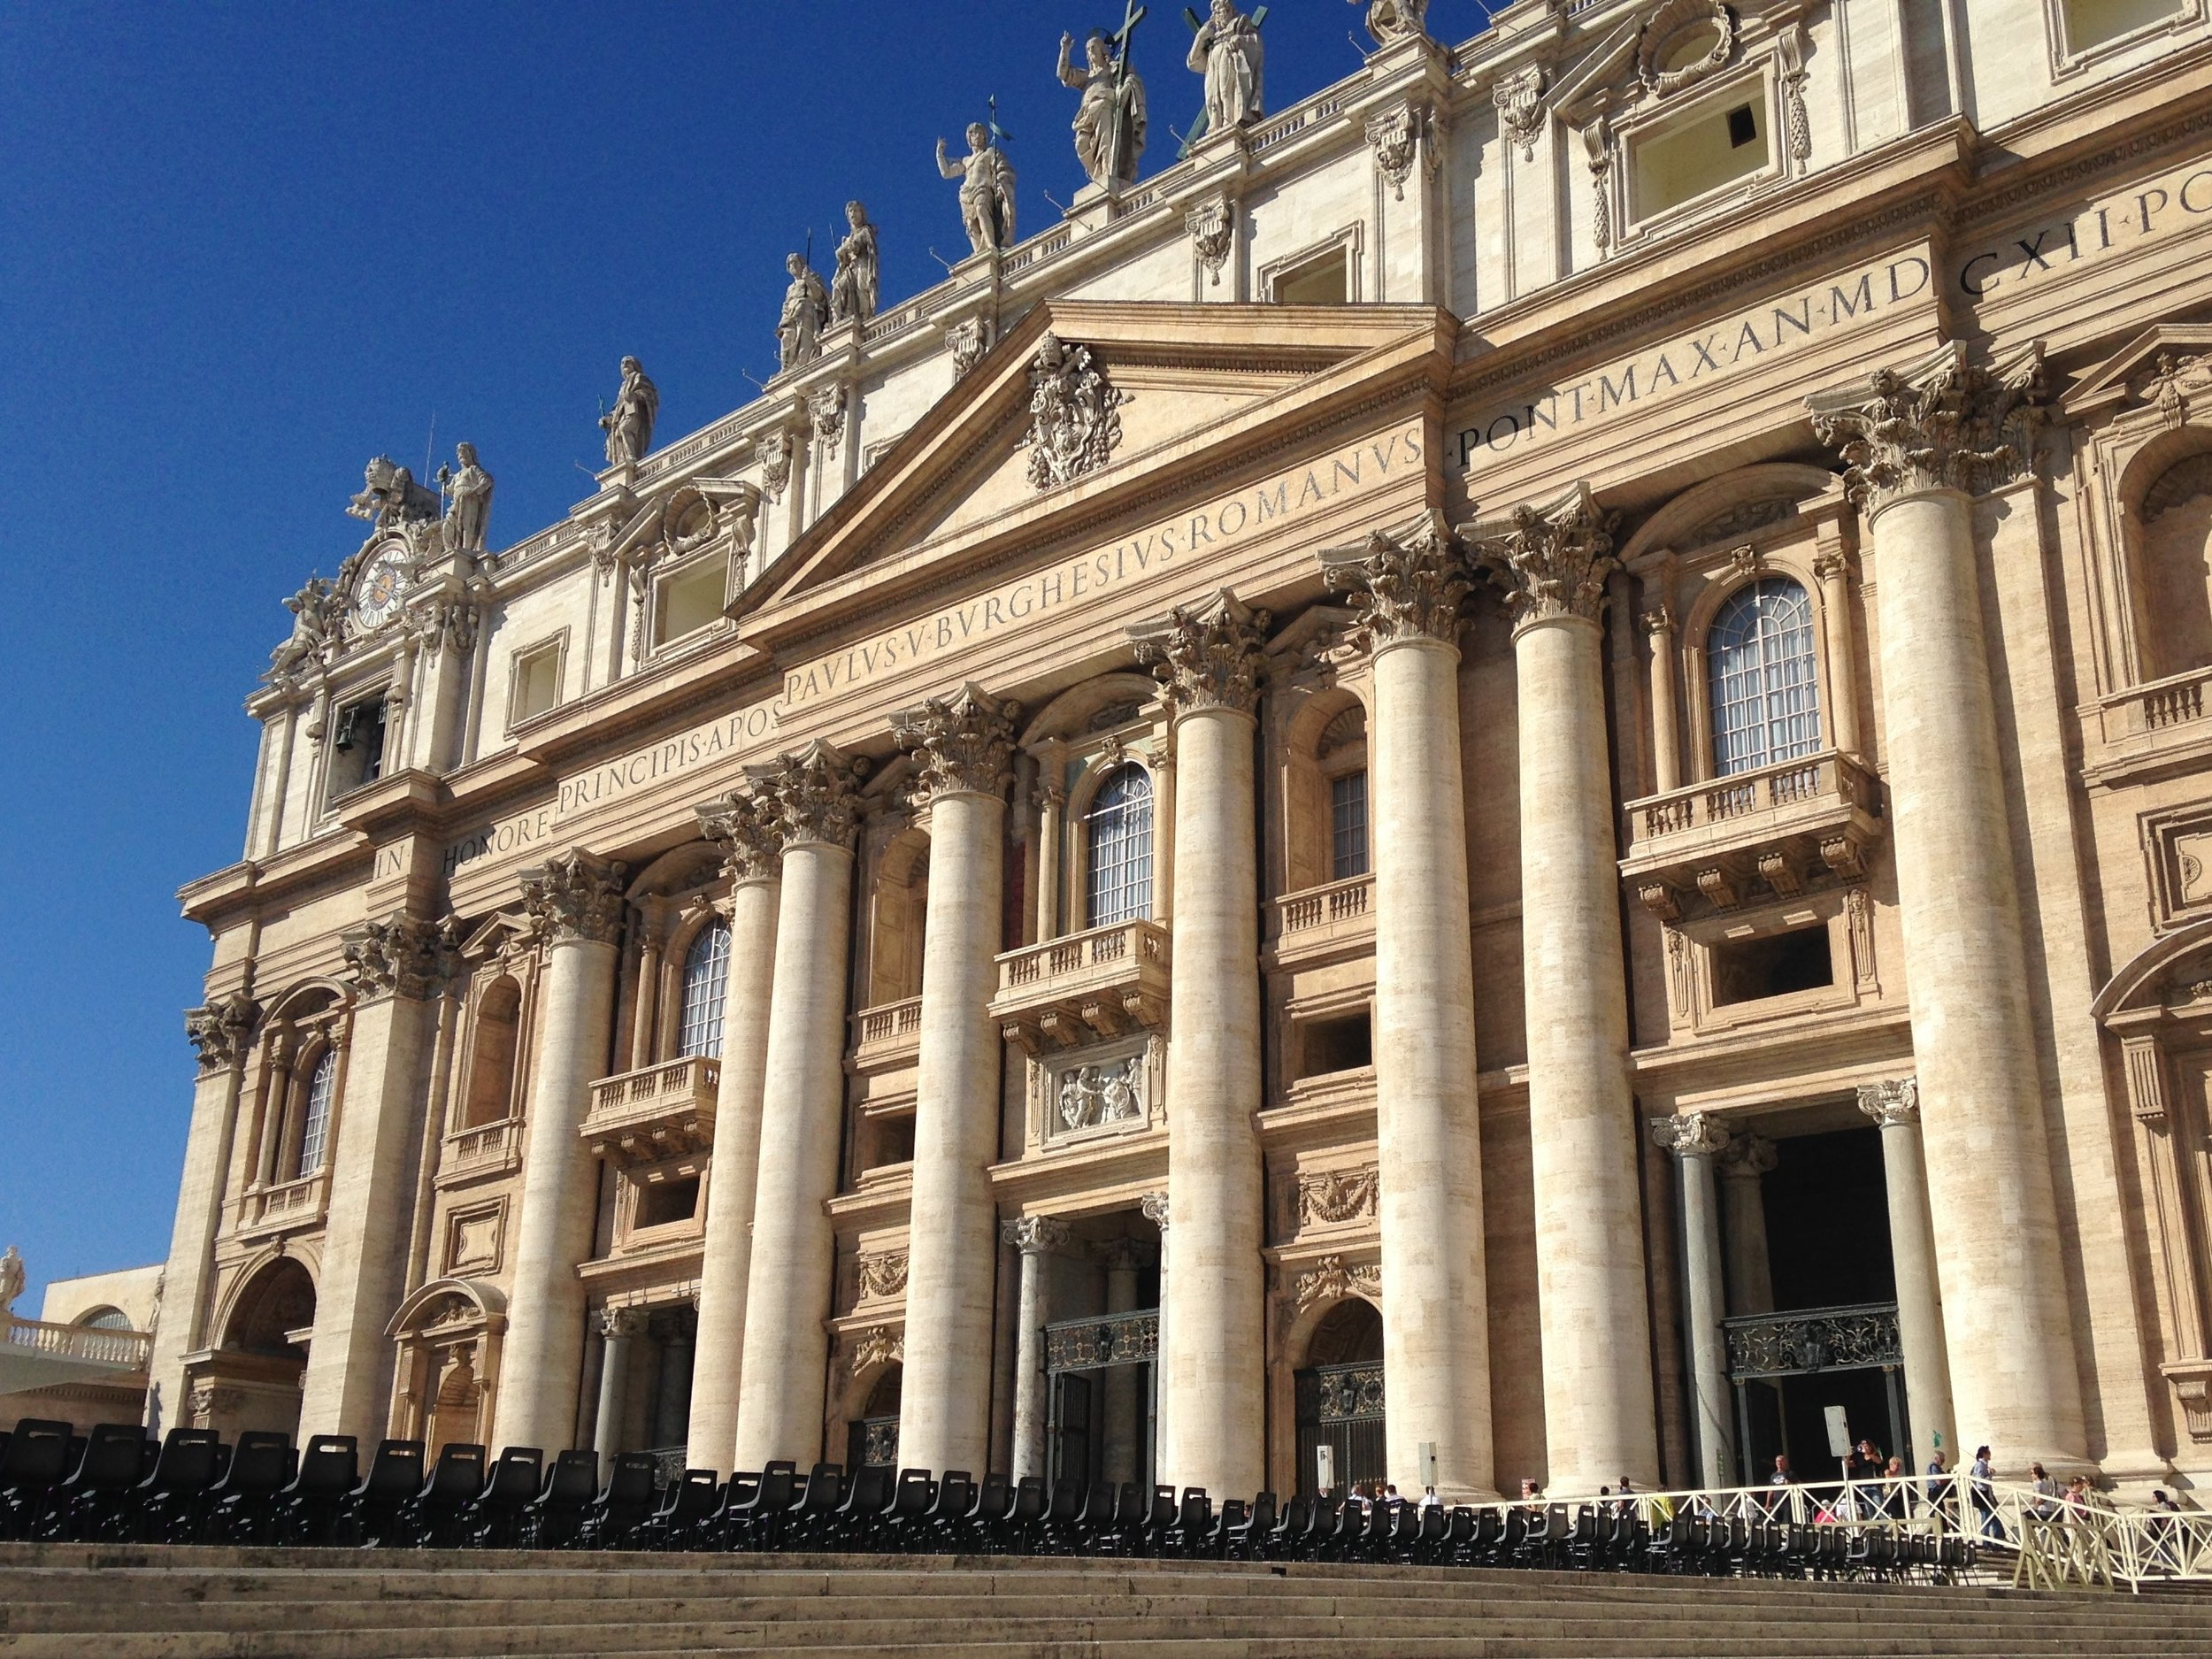 St. Peter's Basilica | Vatican City, Rome